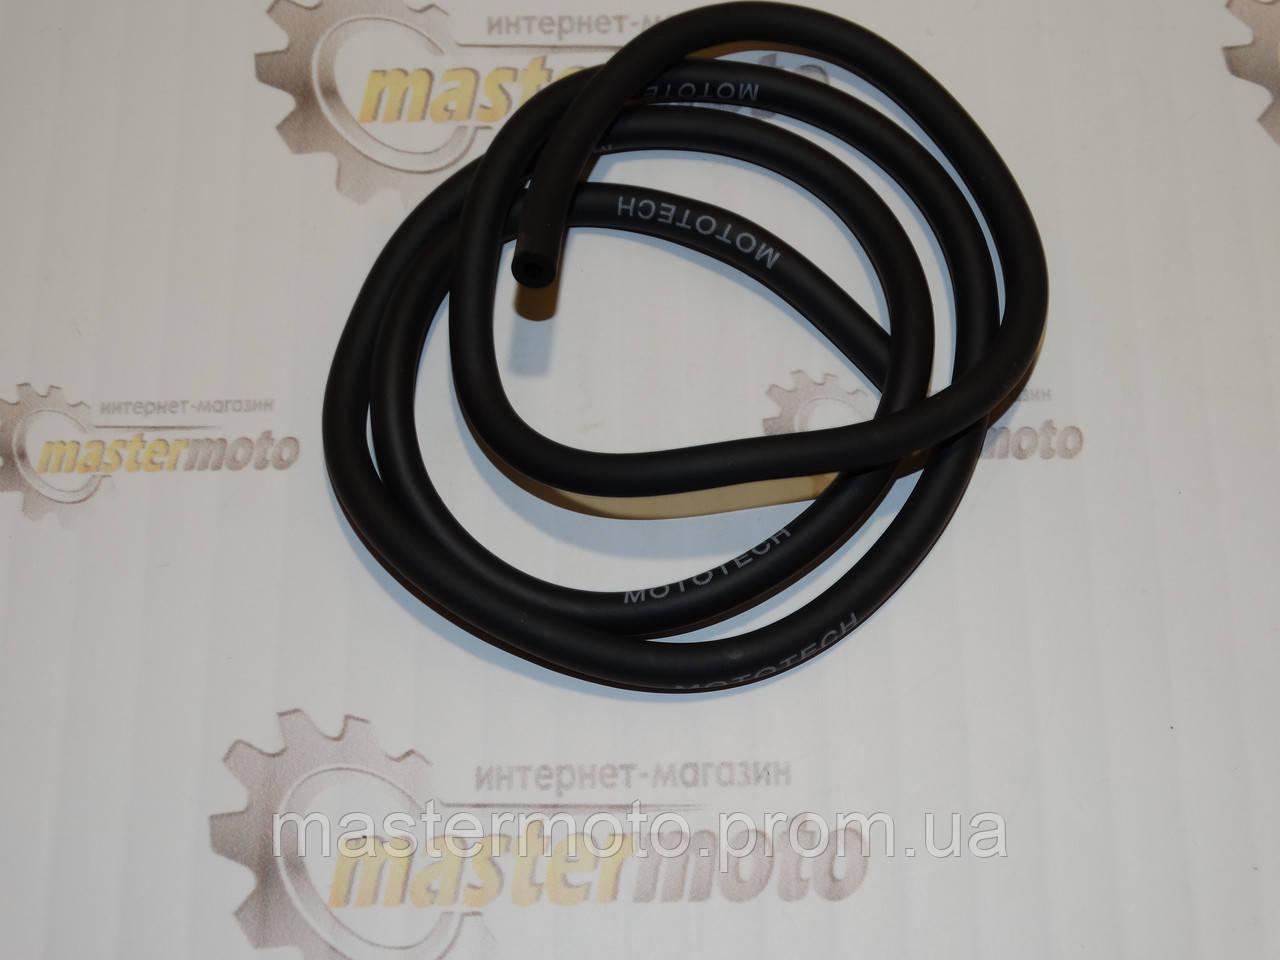 Шланг масляный для скутера Хонда (внешн.6мм/внутр.3мм), метр